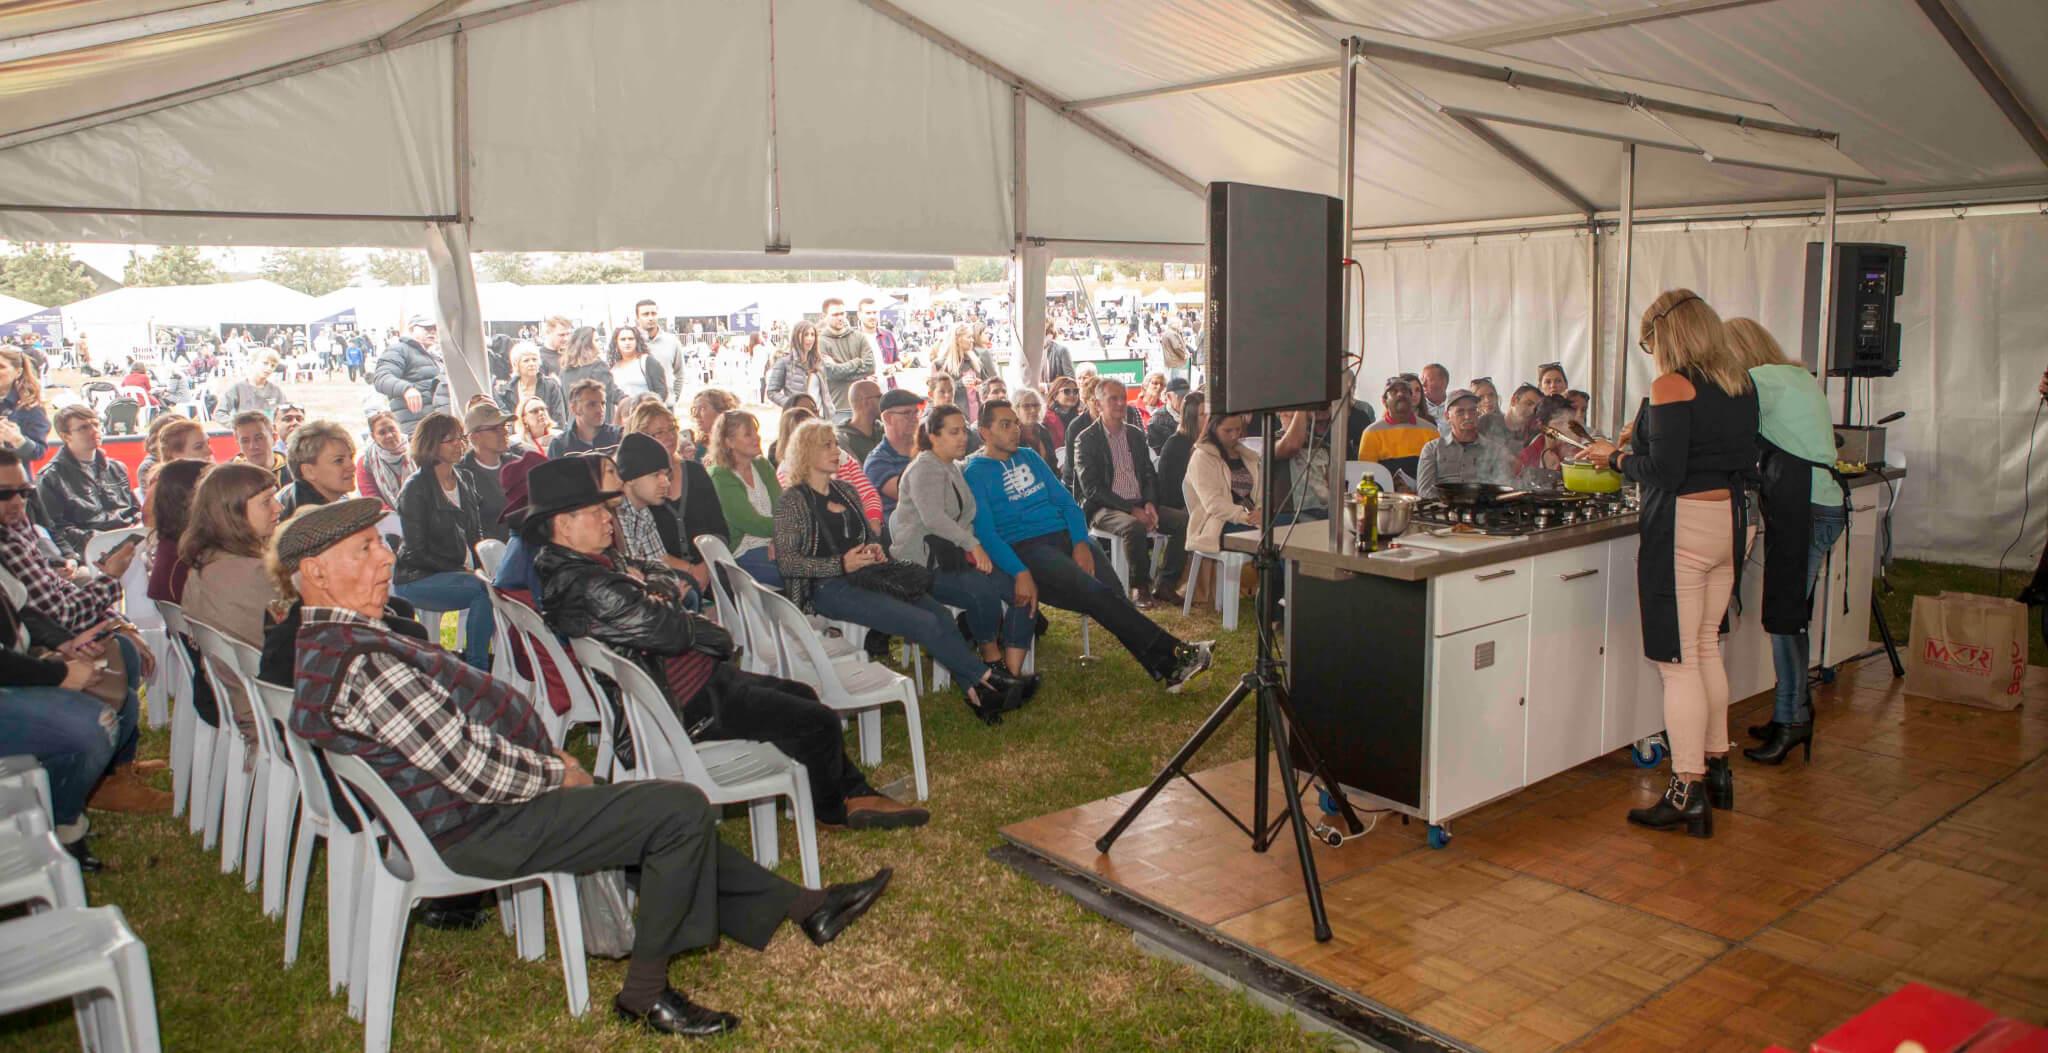 Yarra Valley Food & Wine Festival